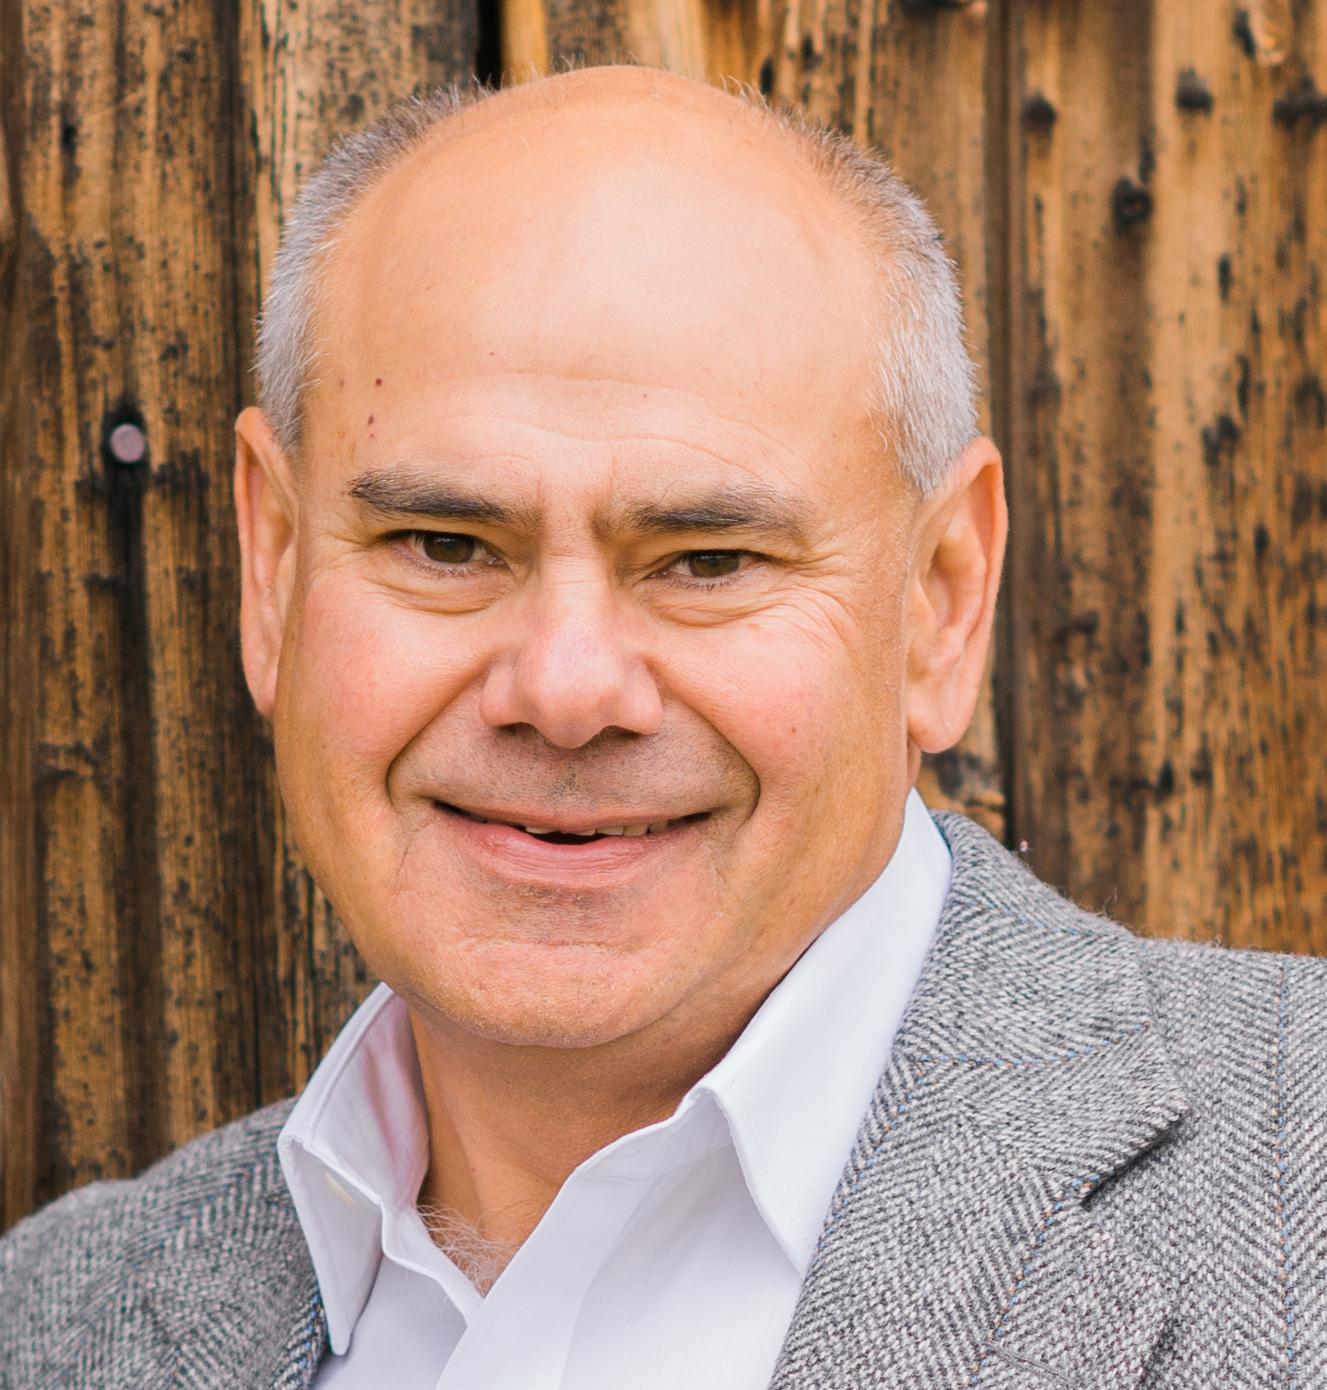 Doug-Labor-Top-Realtor-fastexpert